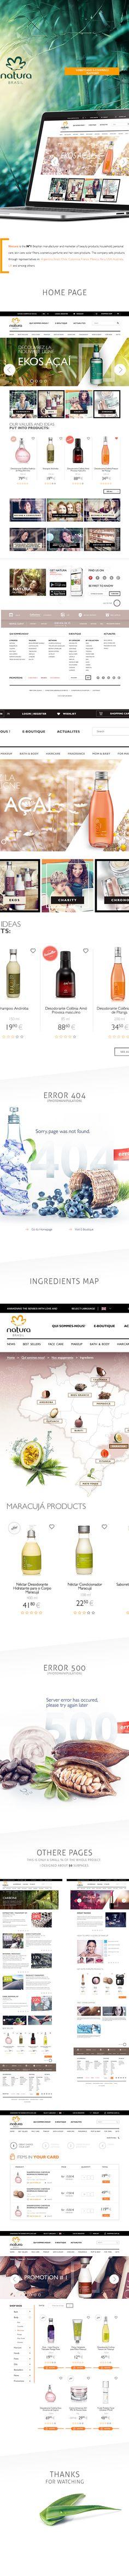 Natura Brasil Website & Shop by Karol Kos, via Behance Website Design Layout, Web Layout, Layout Design, Food Web Design, Solar Filter, Cosmetic Design, Ui Web, Web Design Inspiration, Graphic